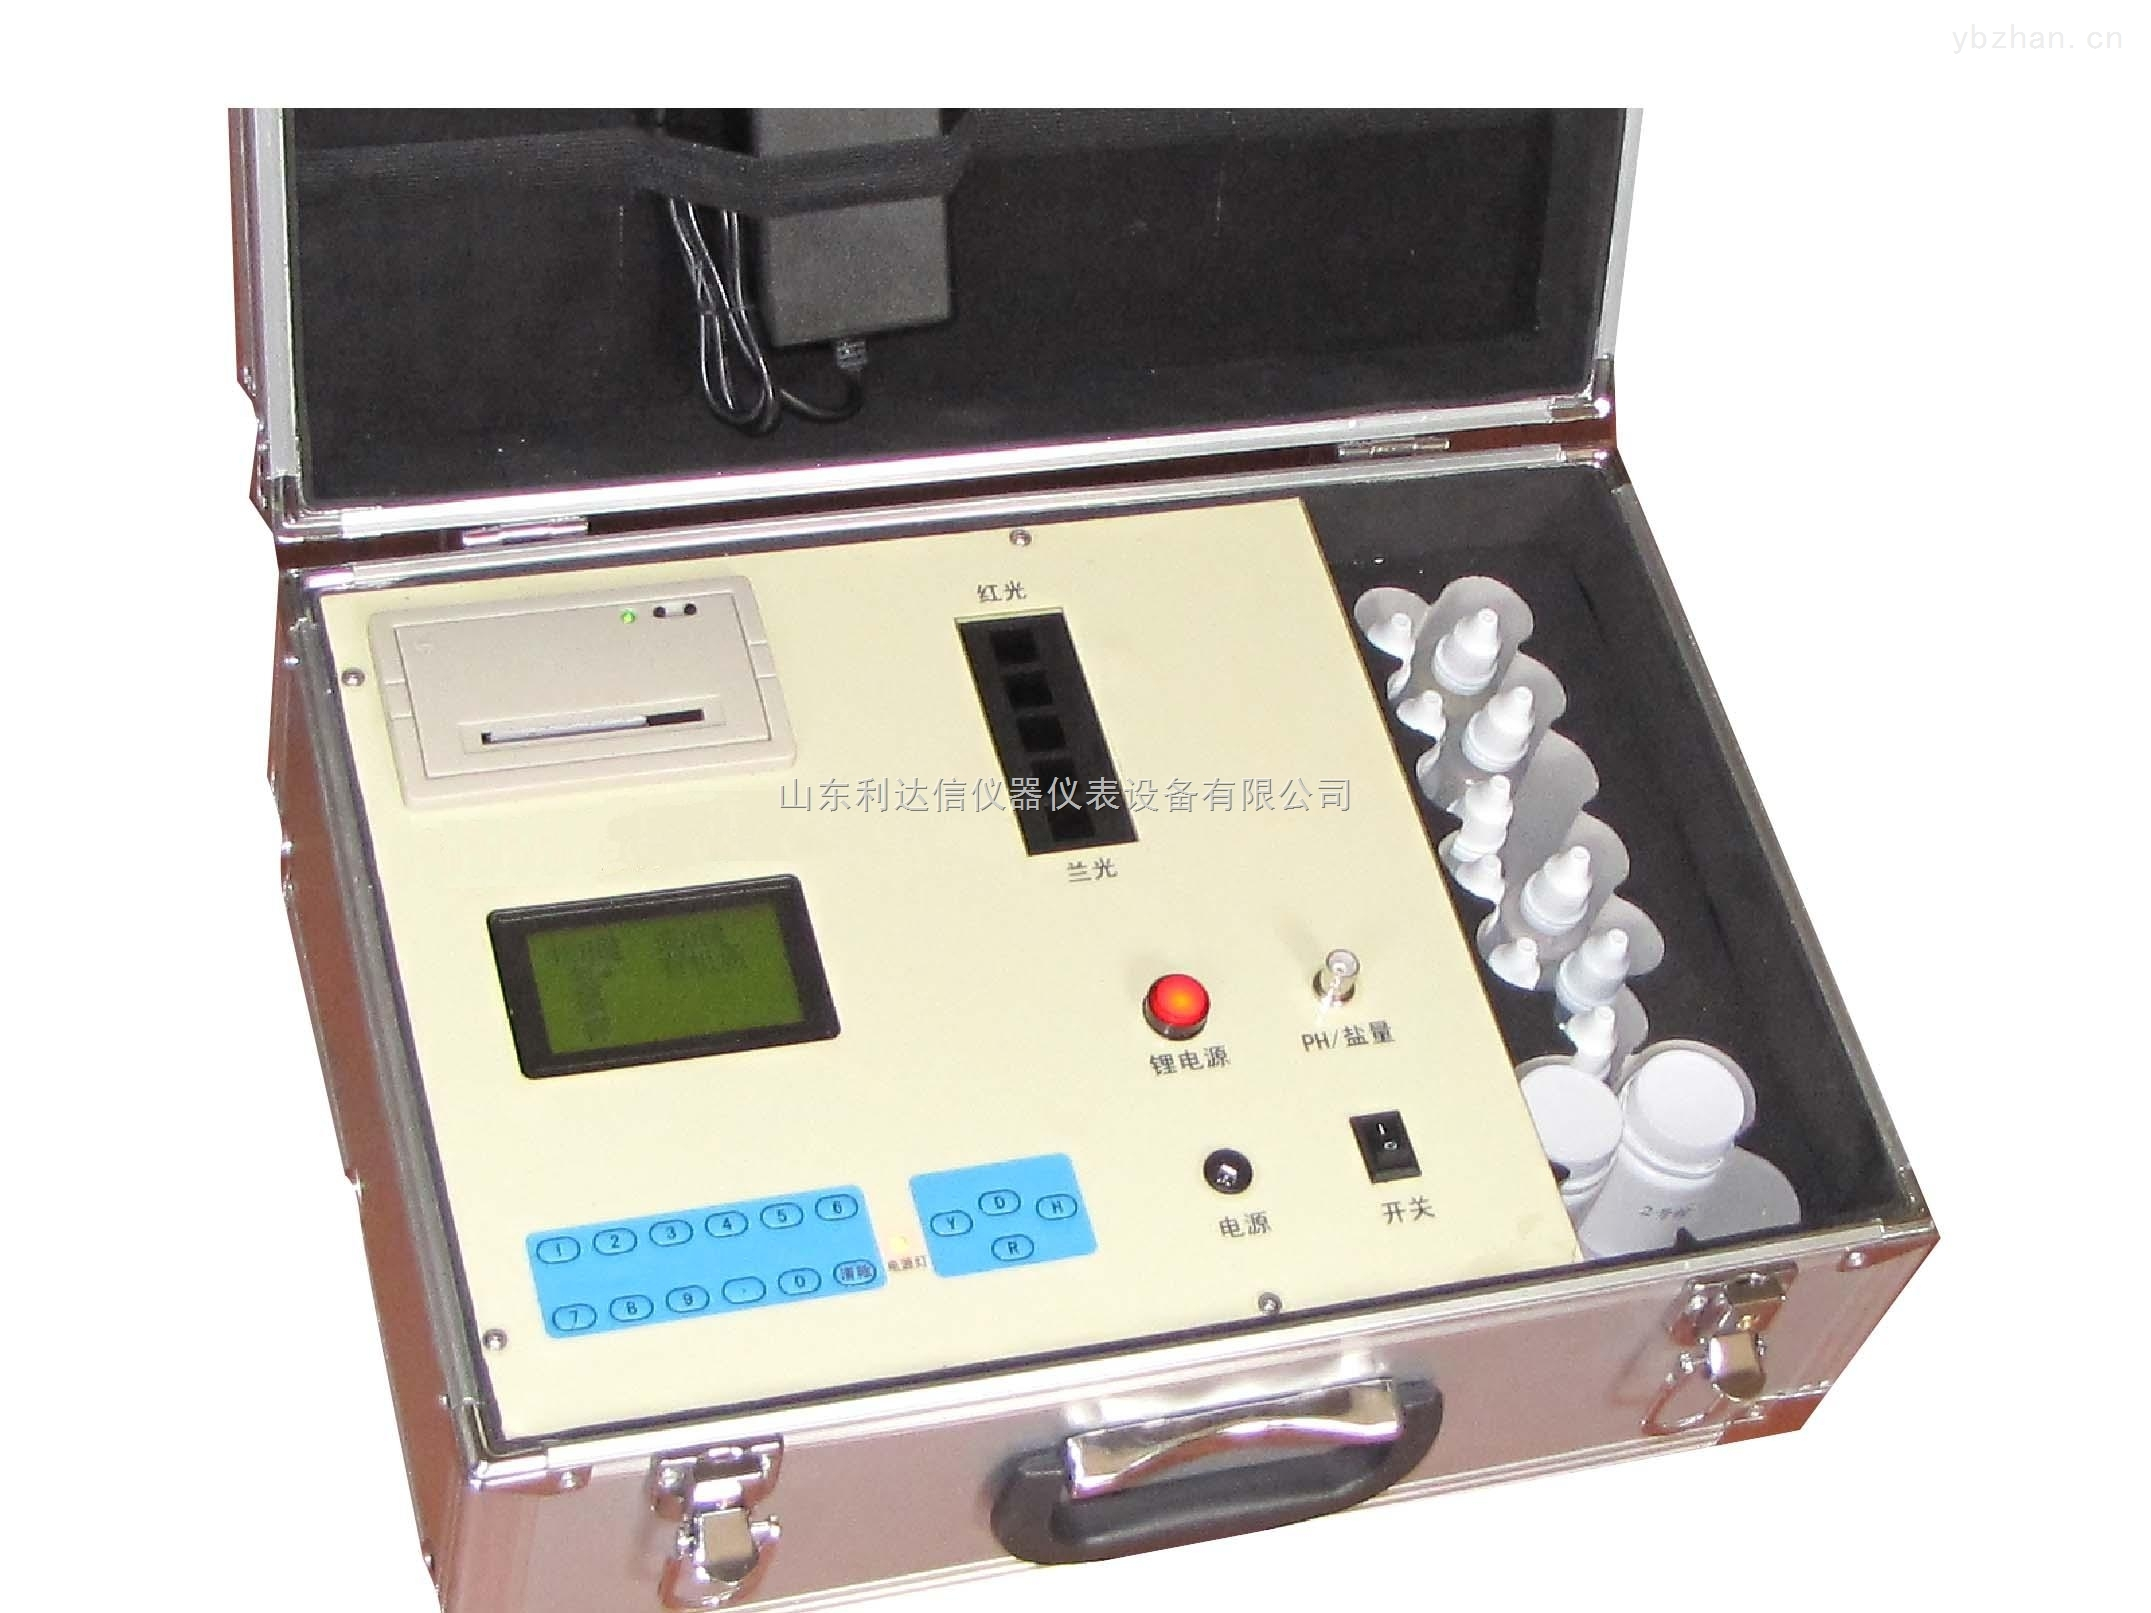 LDX-TRF-2PC-半价优惠土壤养分速测仪/土壤化肥速测仪